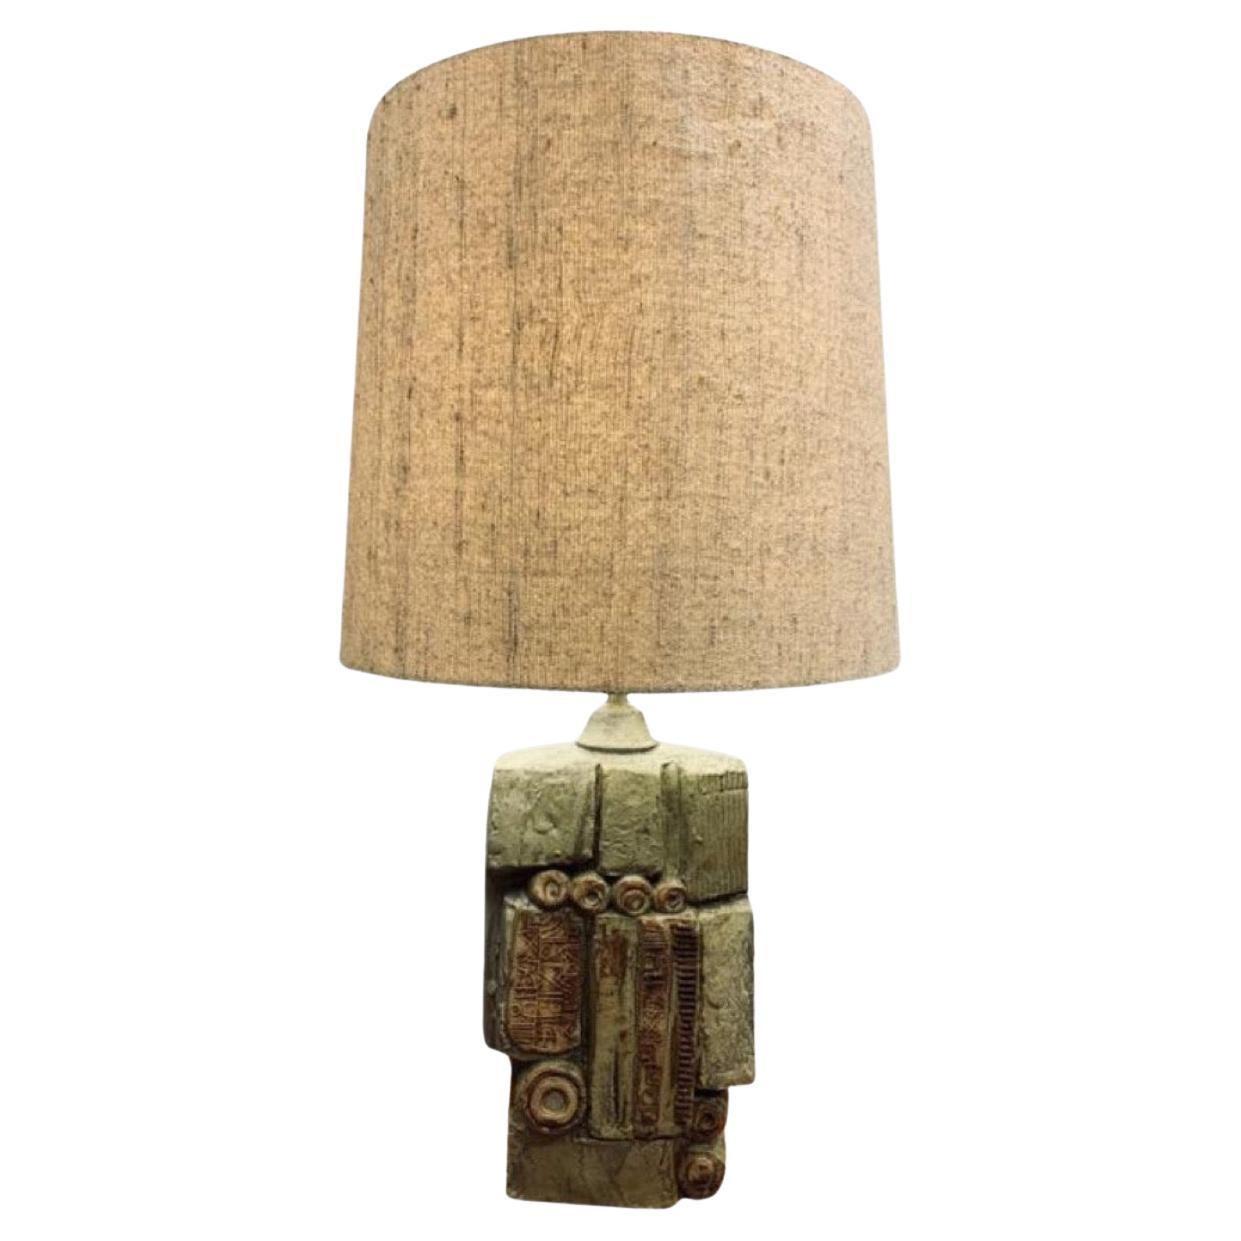 1960s English Bernard Rooke Abstract Sculptural Pottery Ceramic Table Lamp